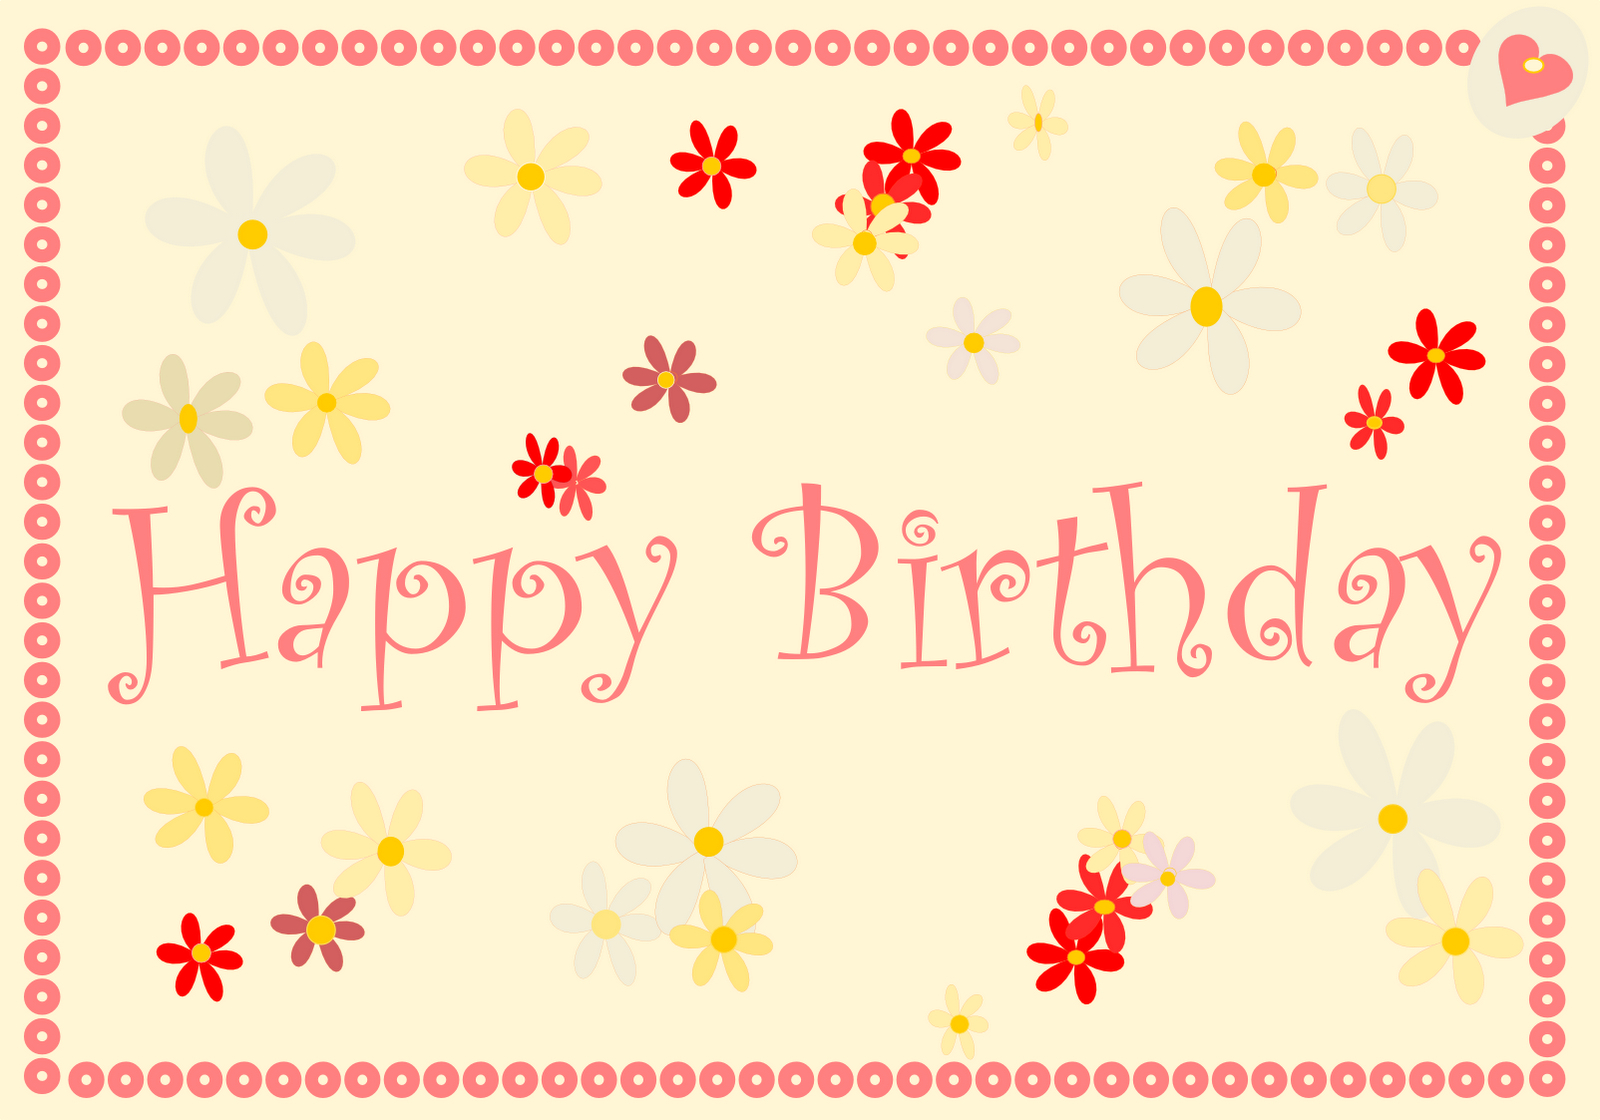 Happy Birthday Cards Online Free Printable - Free Printable Happy Birthday Cards Online